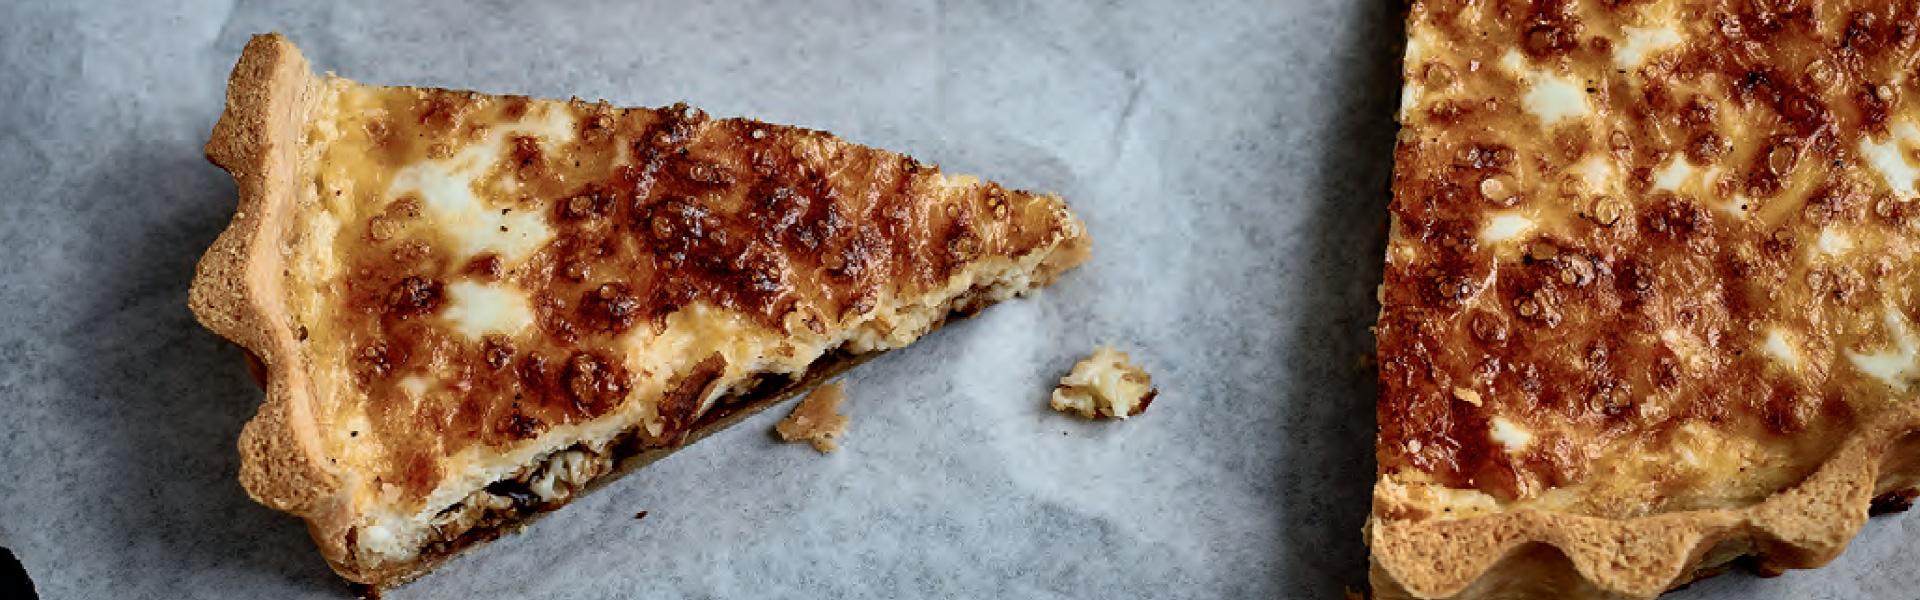 Nadiya Hussain: Ploughman's Cheese and Pickle Tart Recipe